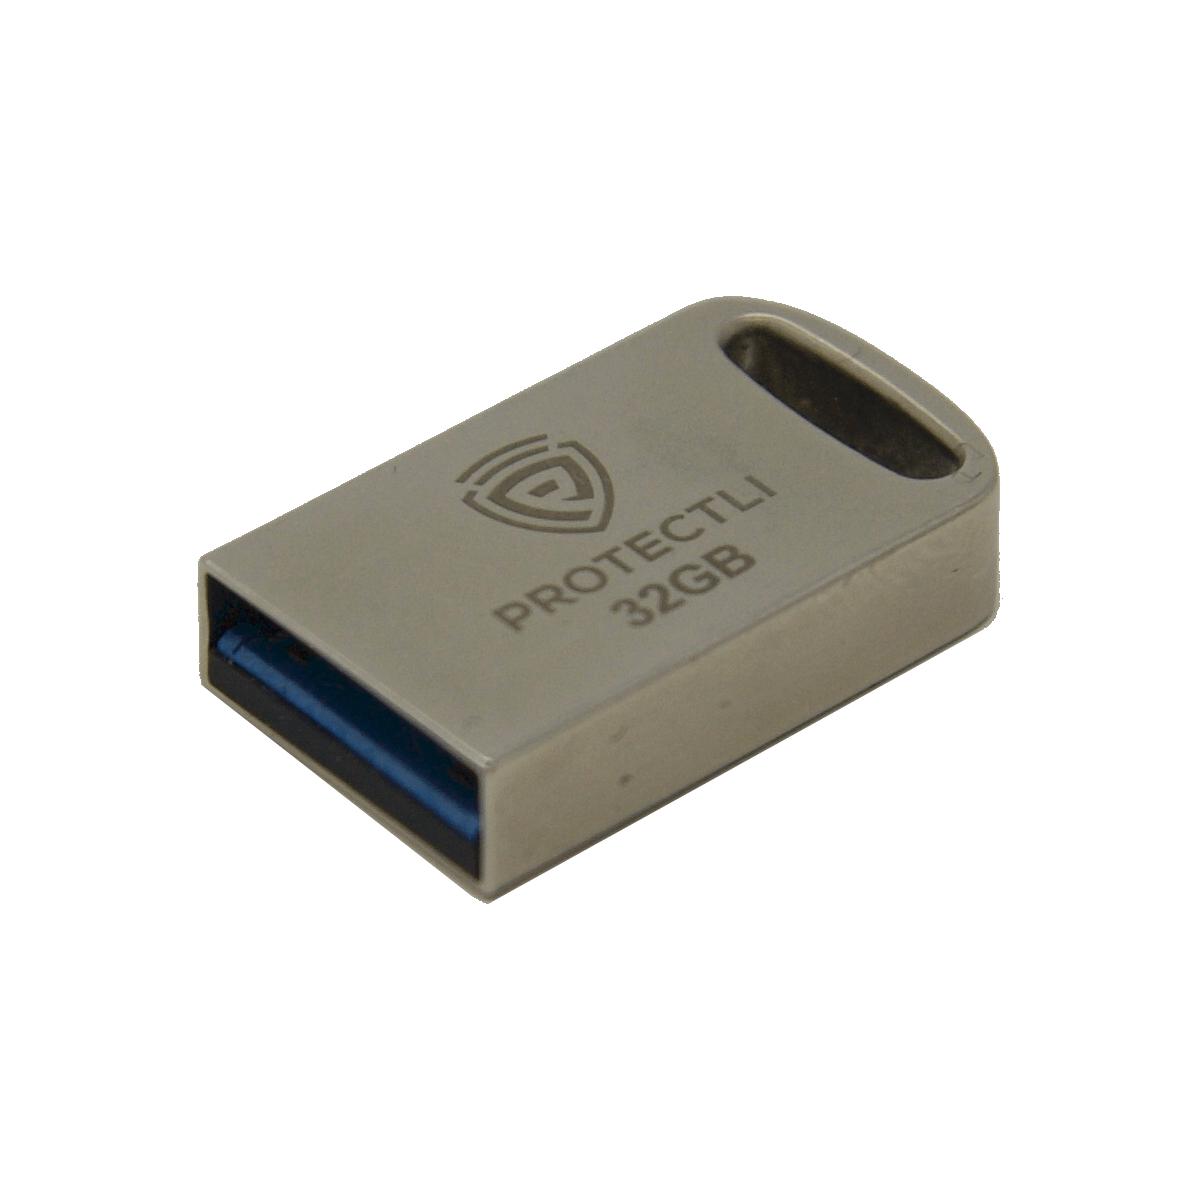 Protectli USB Drive